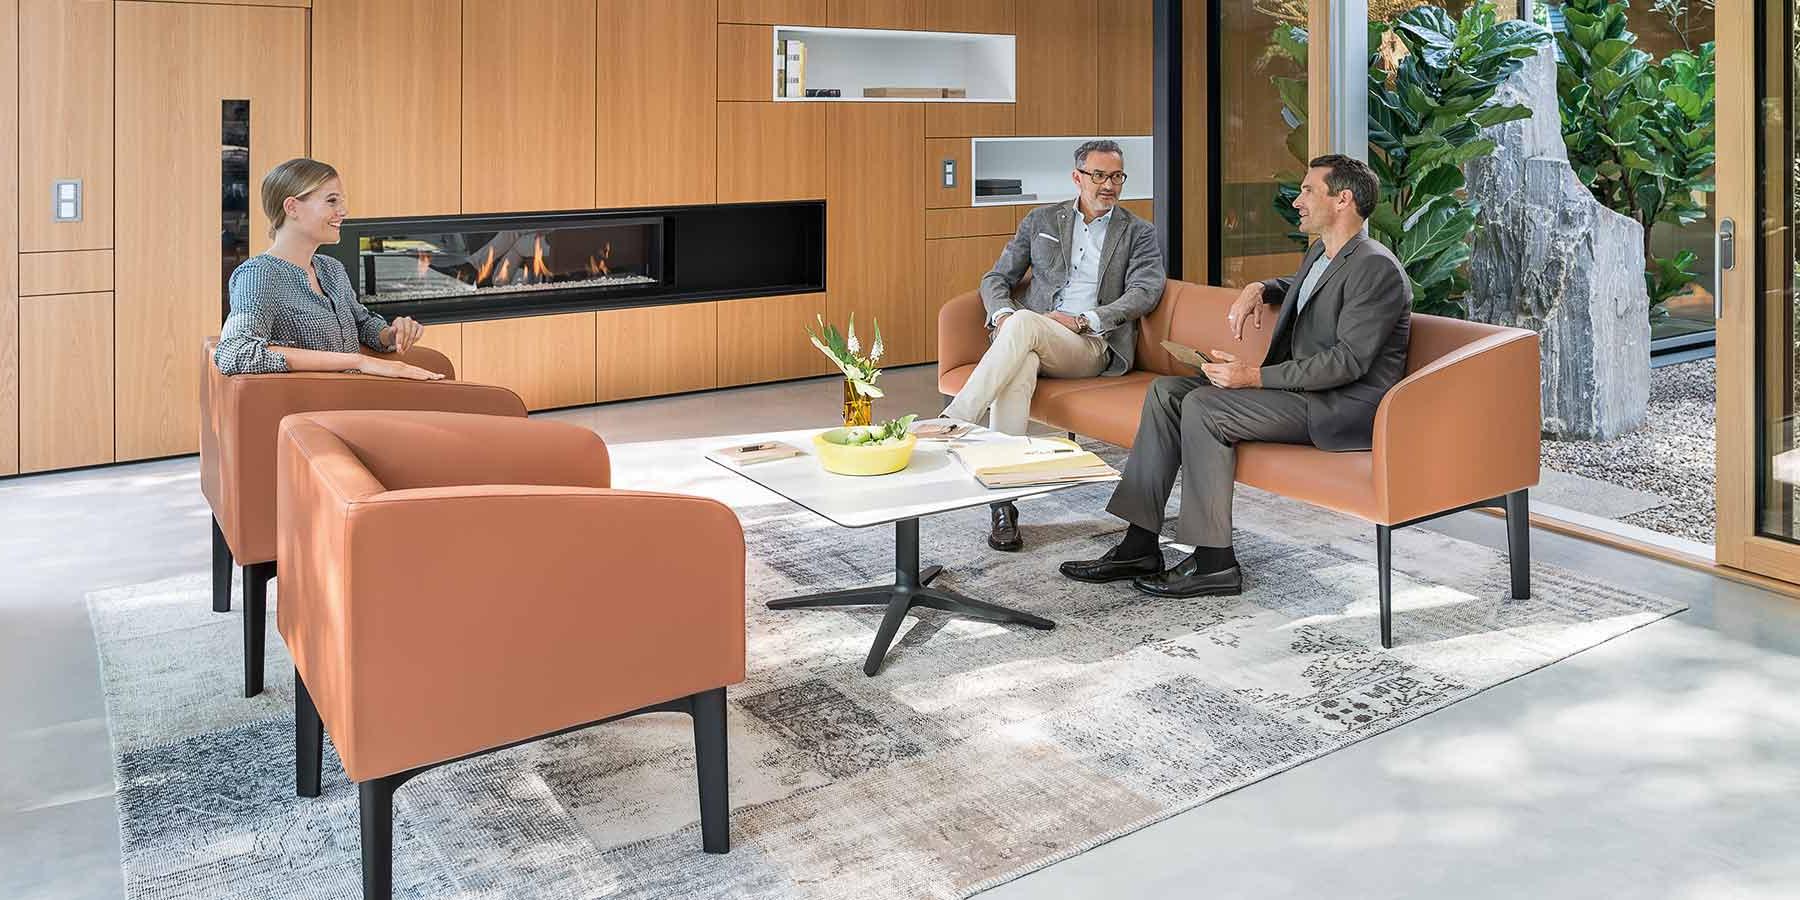 Sillones De Oficina H9d9 Funciones De Los Sillones De Oficina En El soft Seating